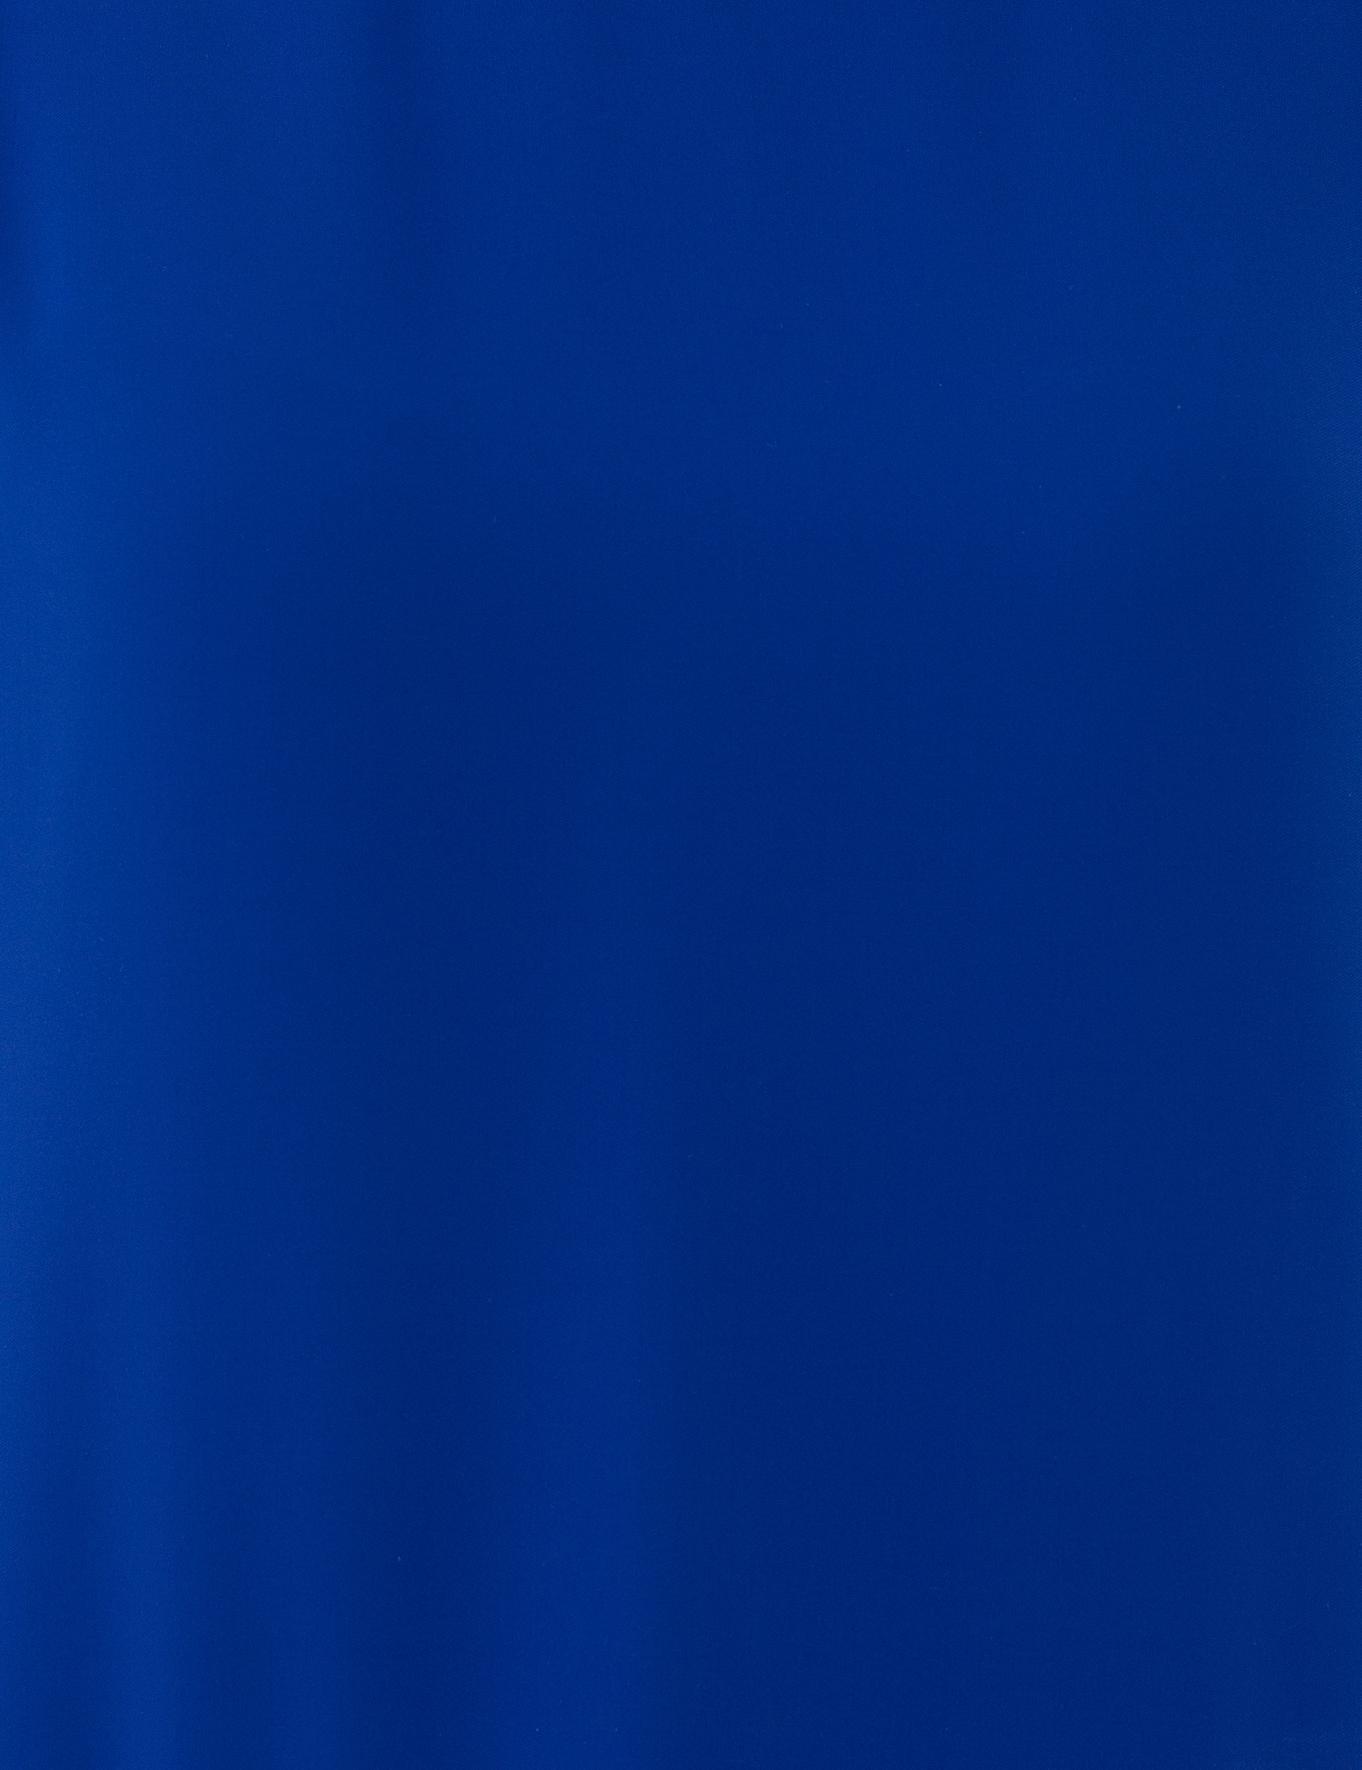 Saks Mavi Standart Fit Bisiklet Yaka Bluz